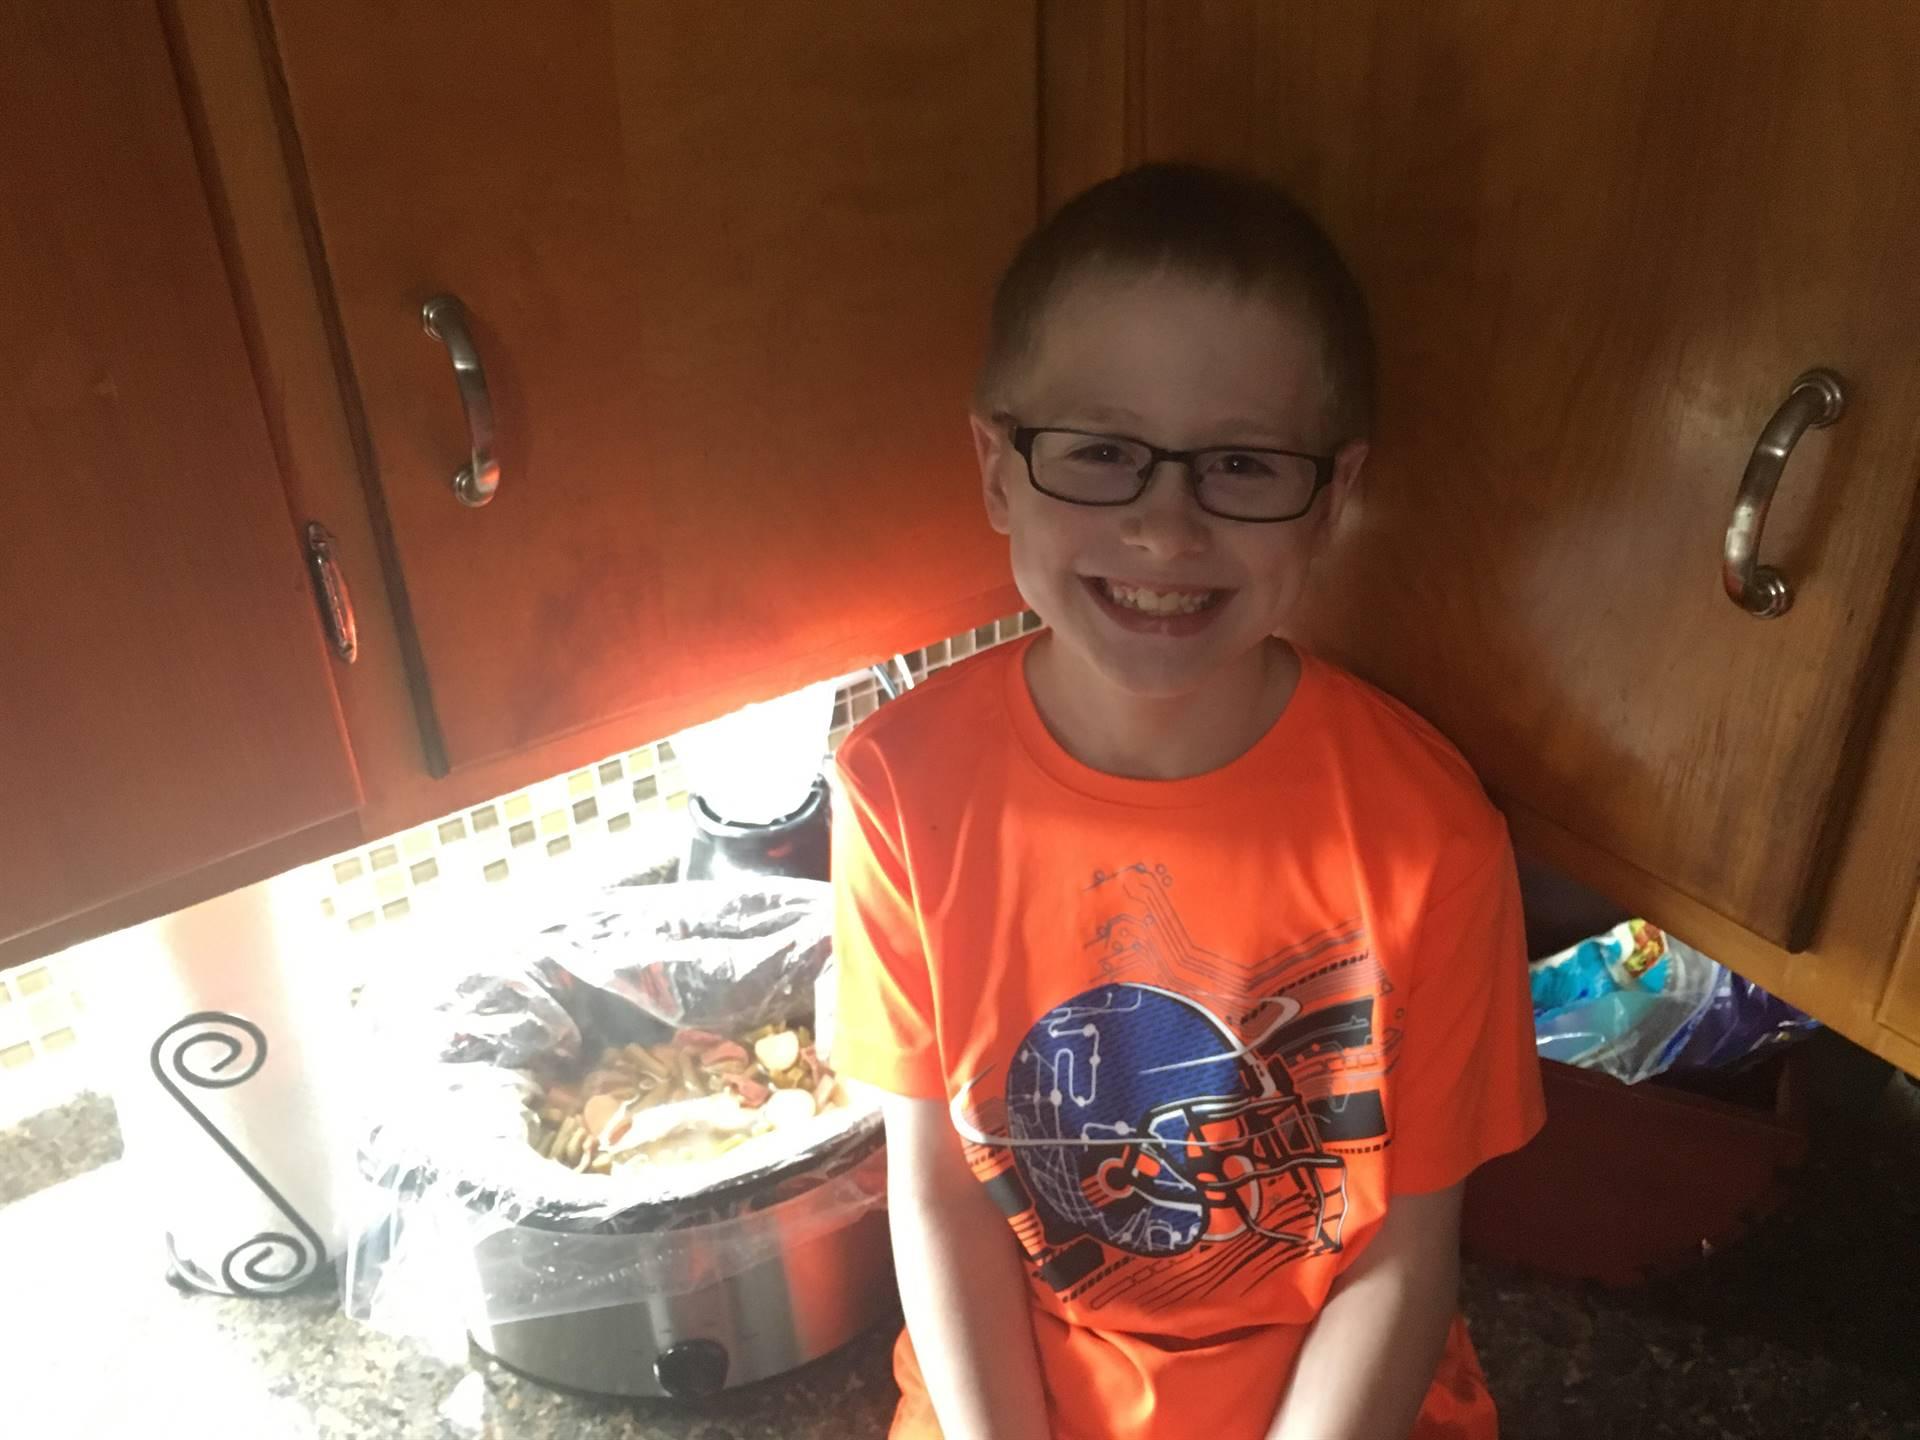 boy with crockpot